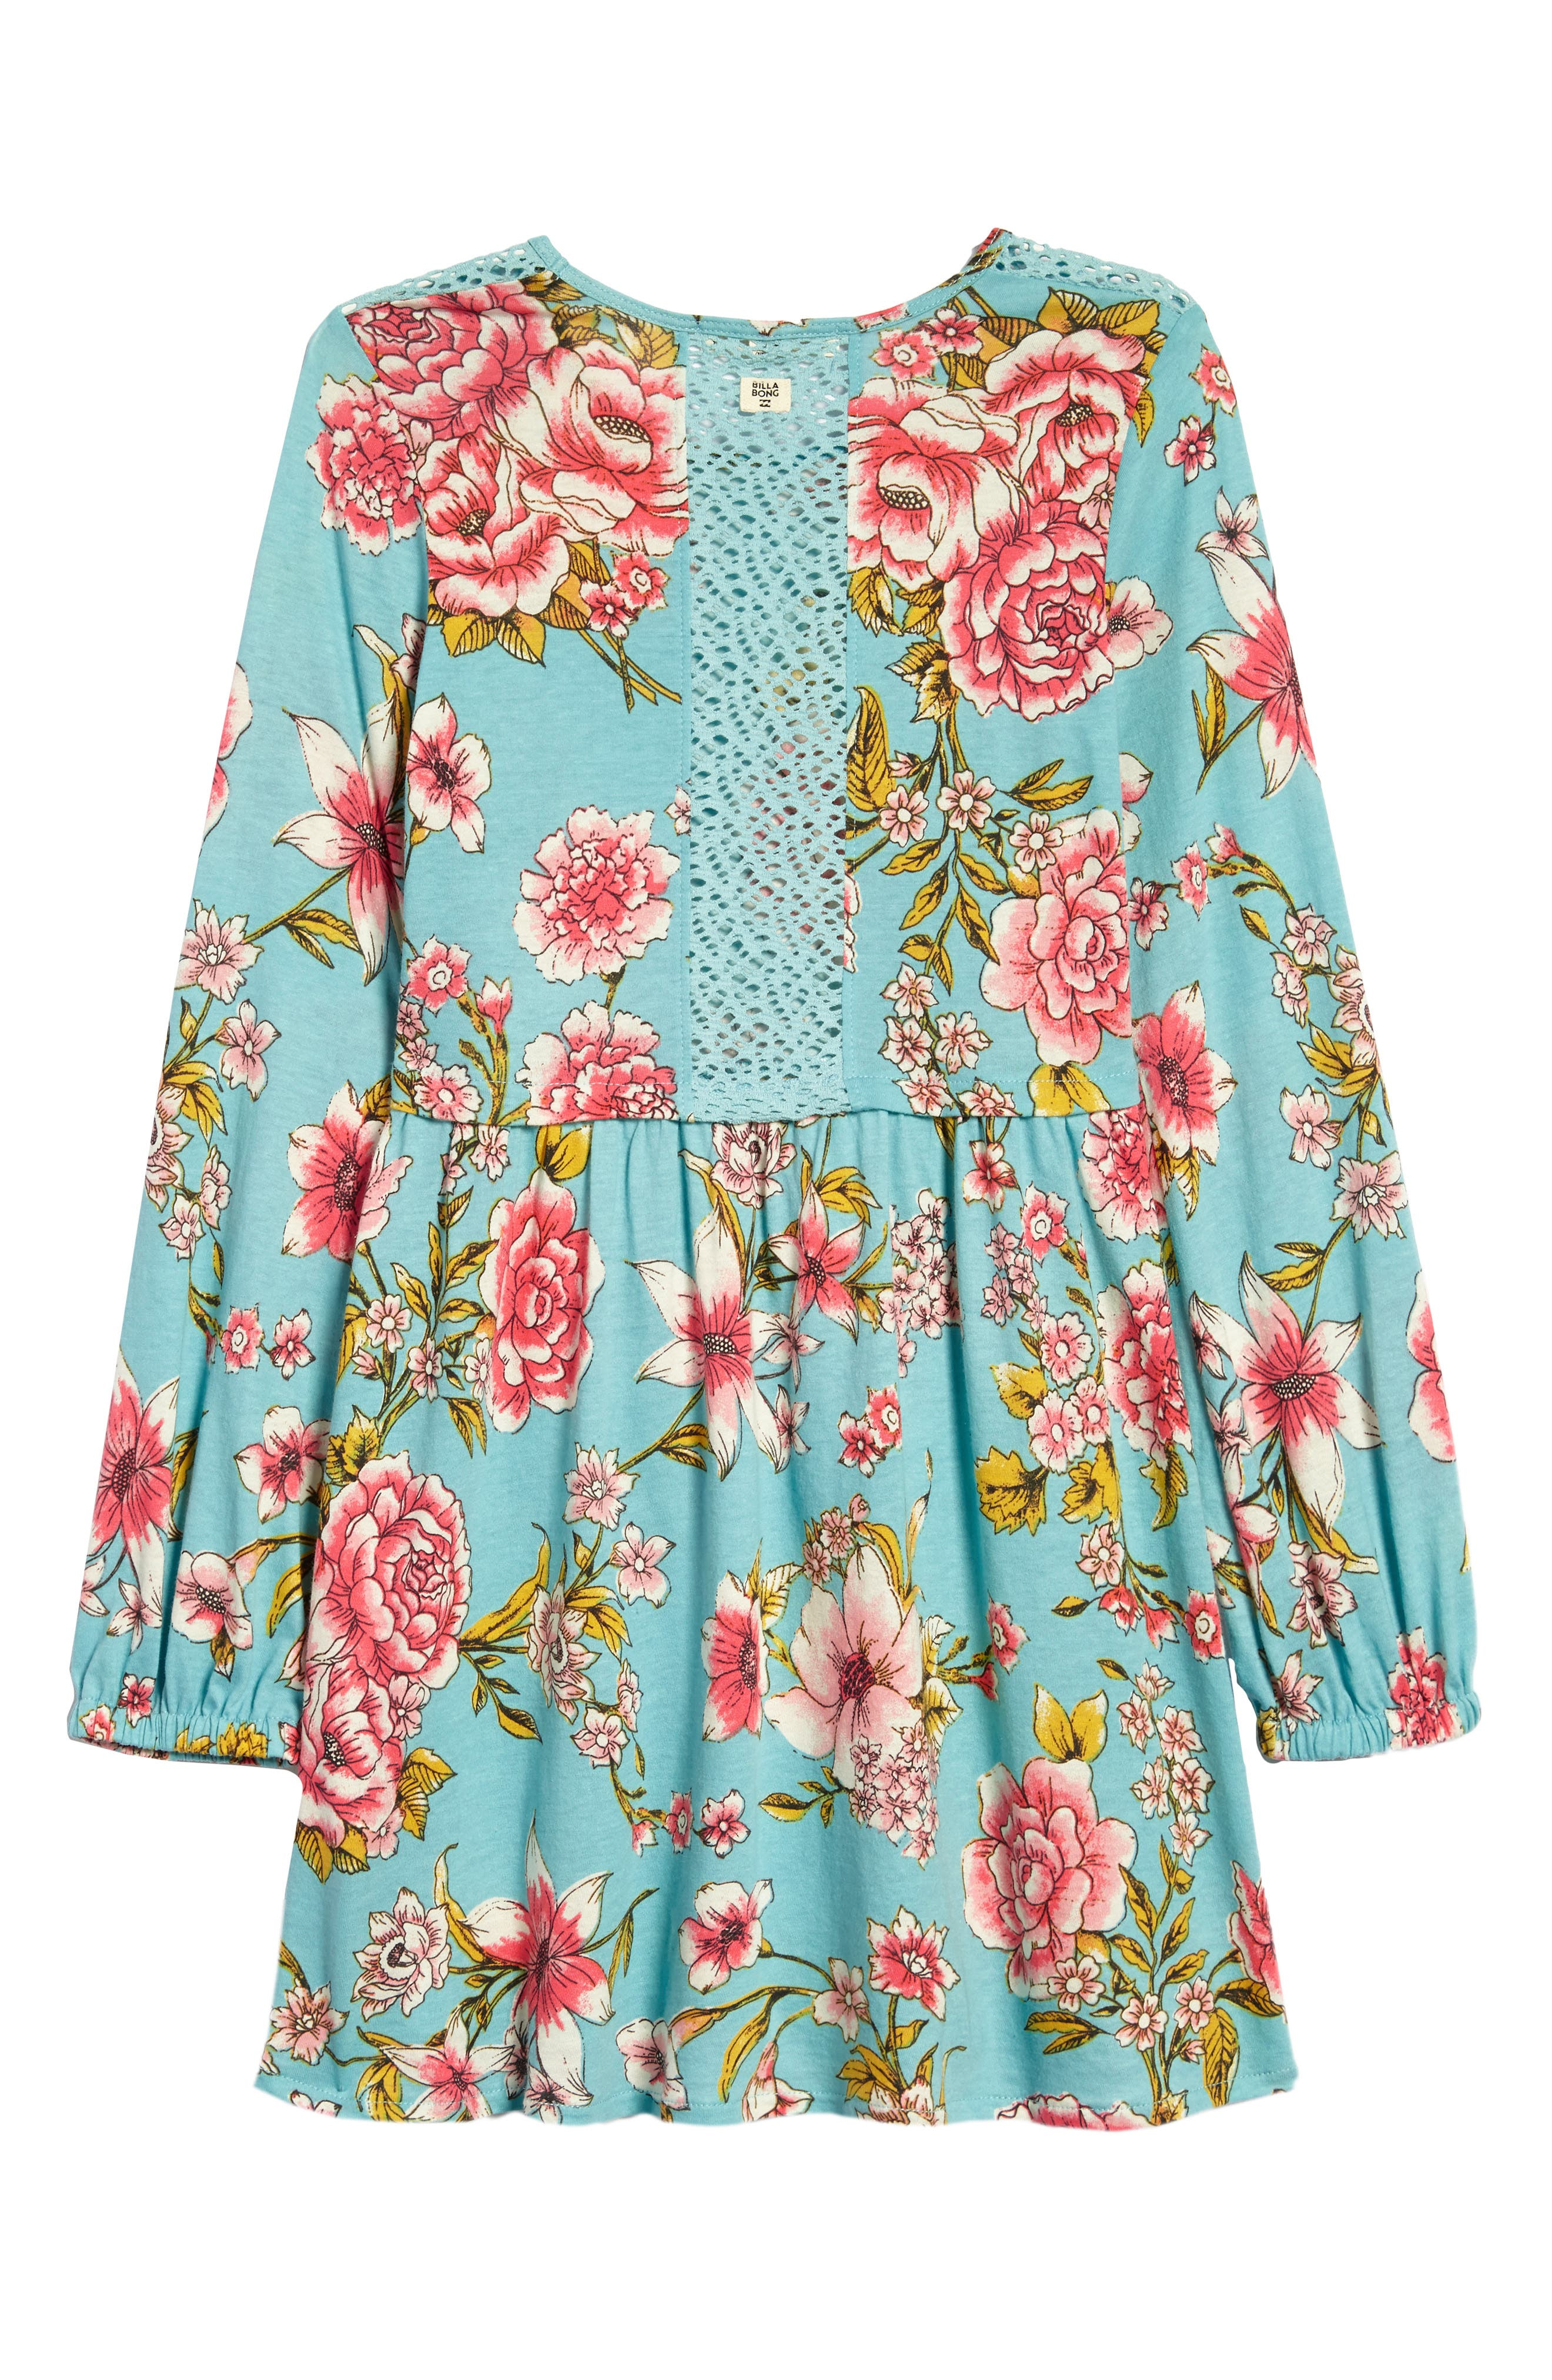 Me Oh My Dress,                             Alternate thumbnail 3, color,                             446